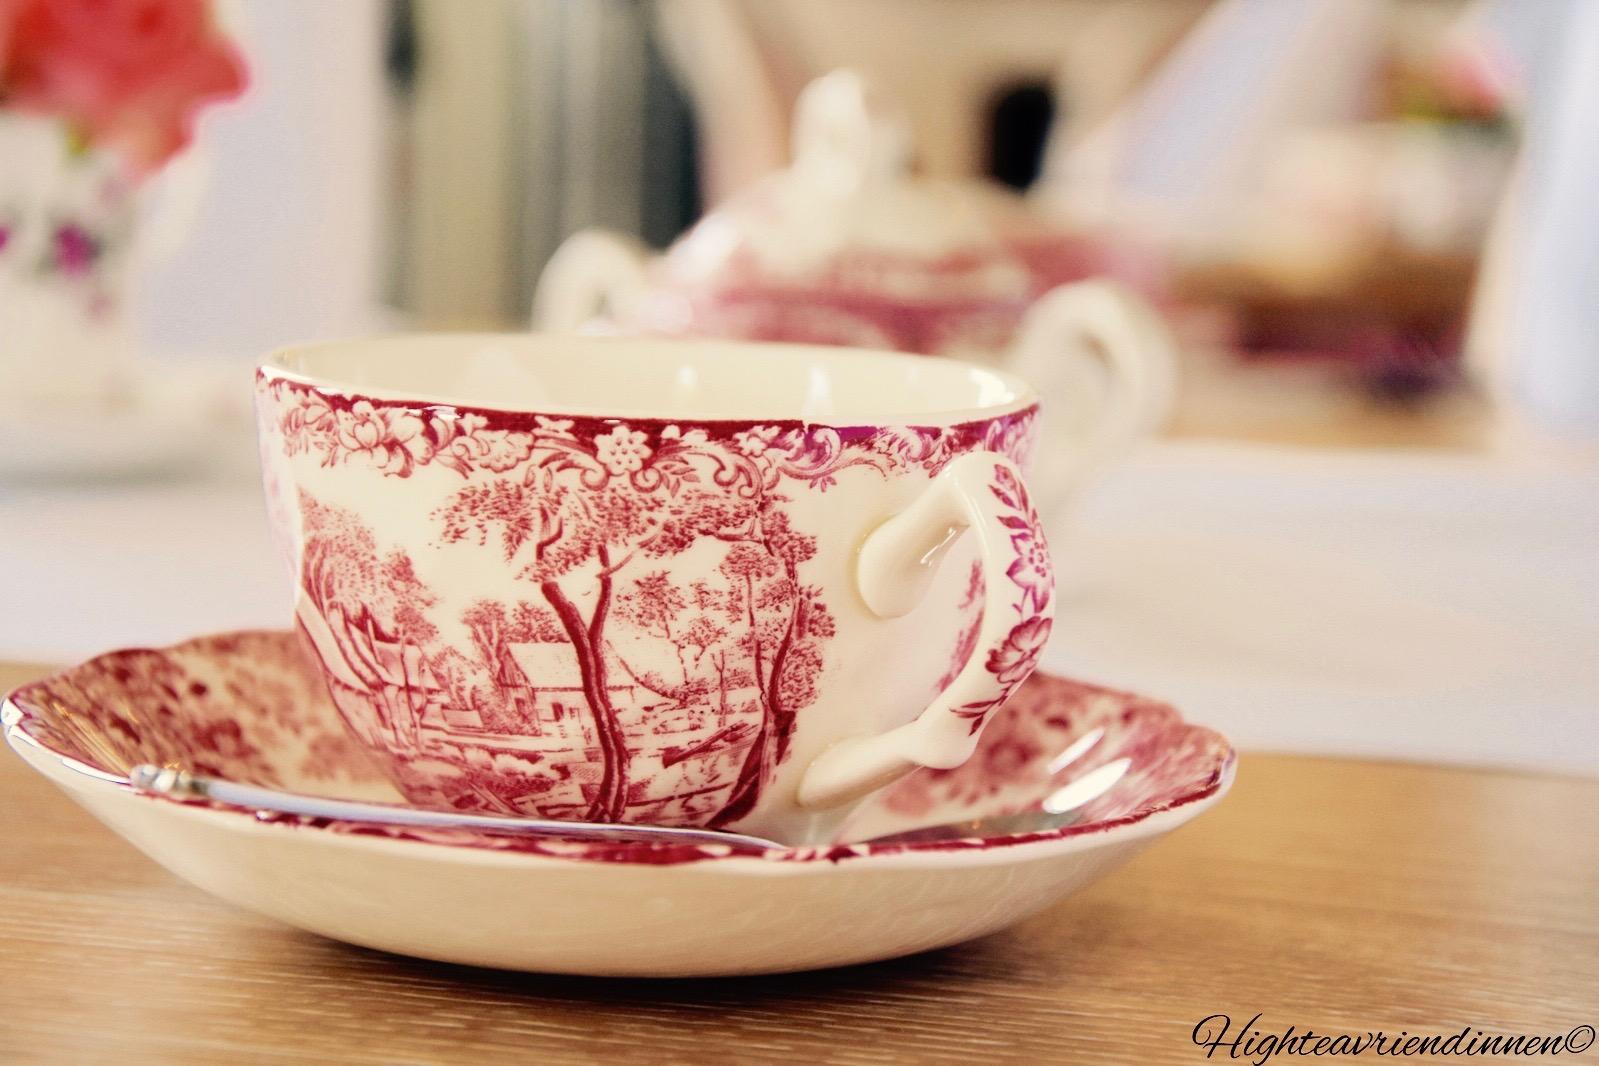 hightealicious, high tea, high tea vriendinnen